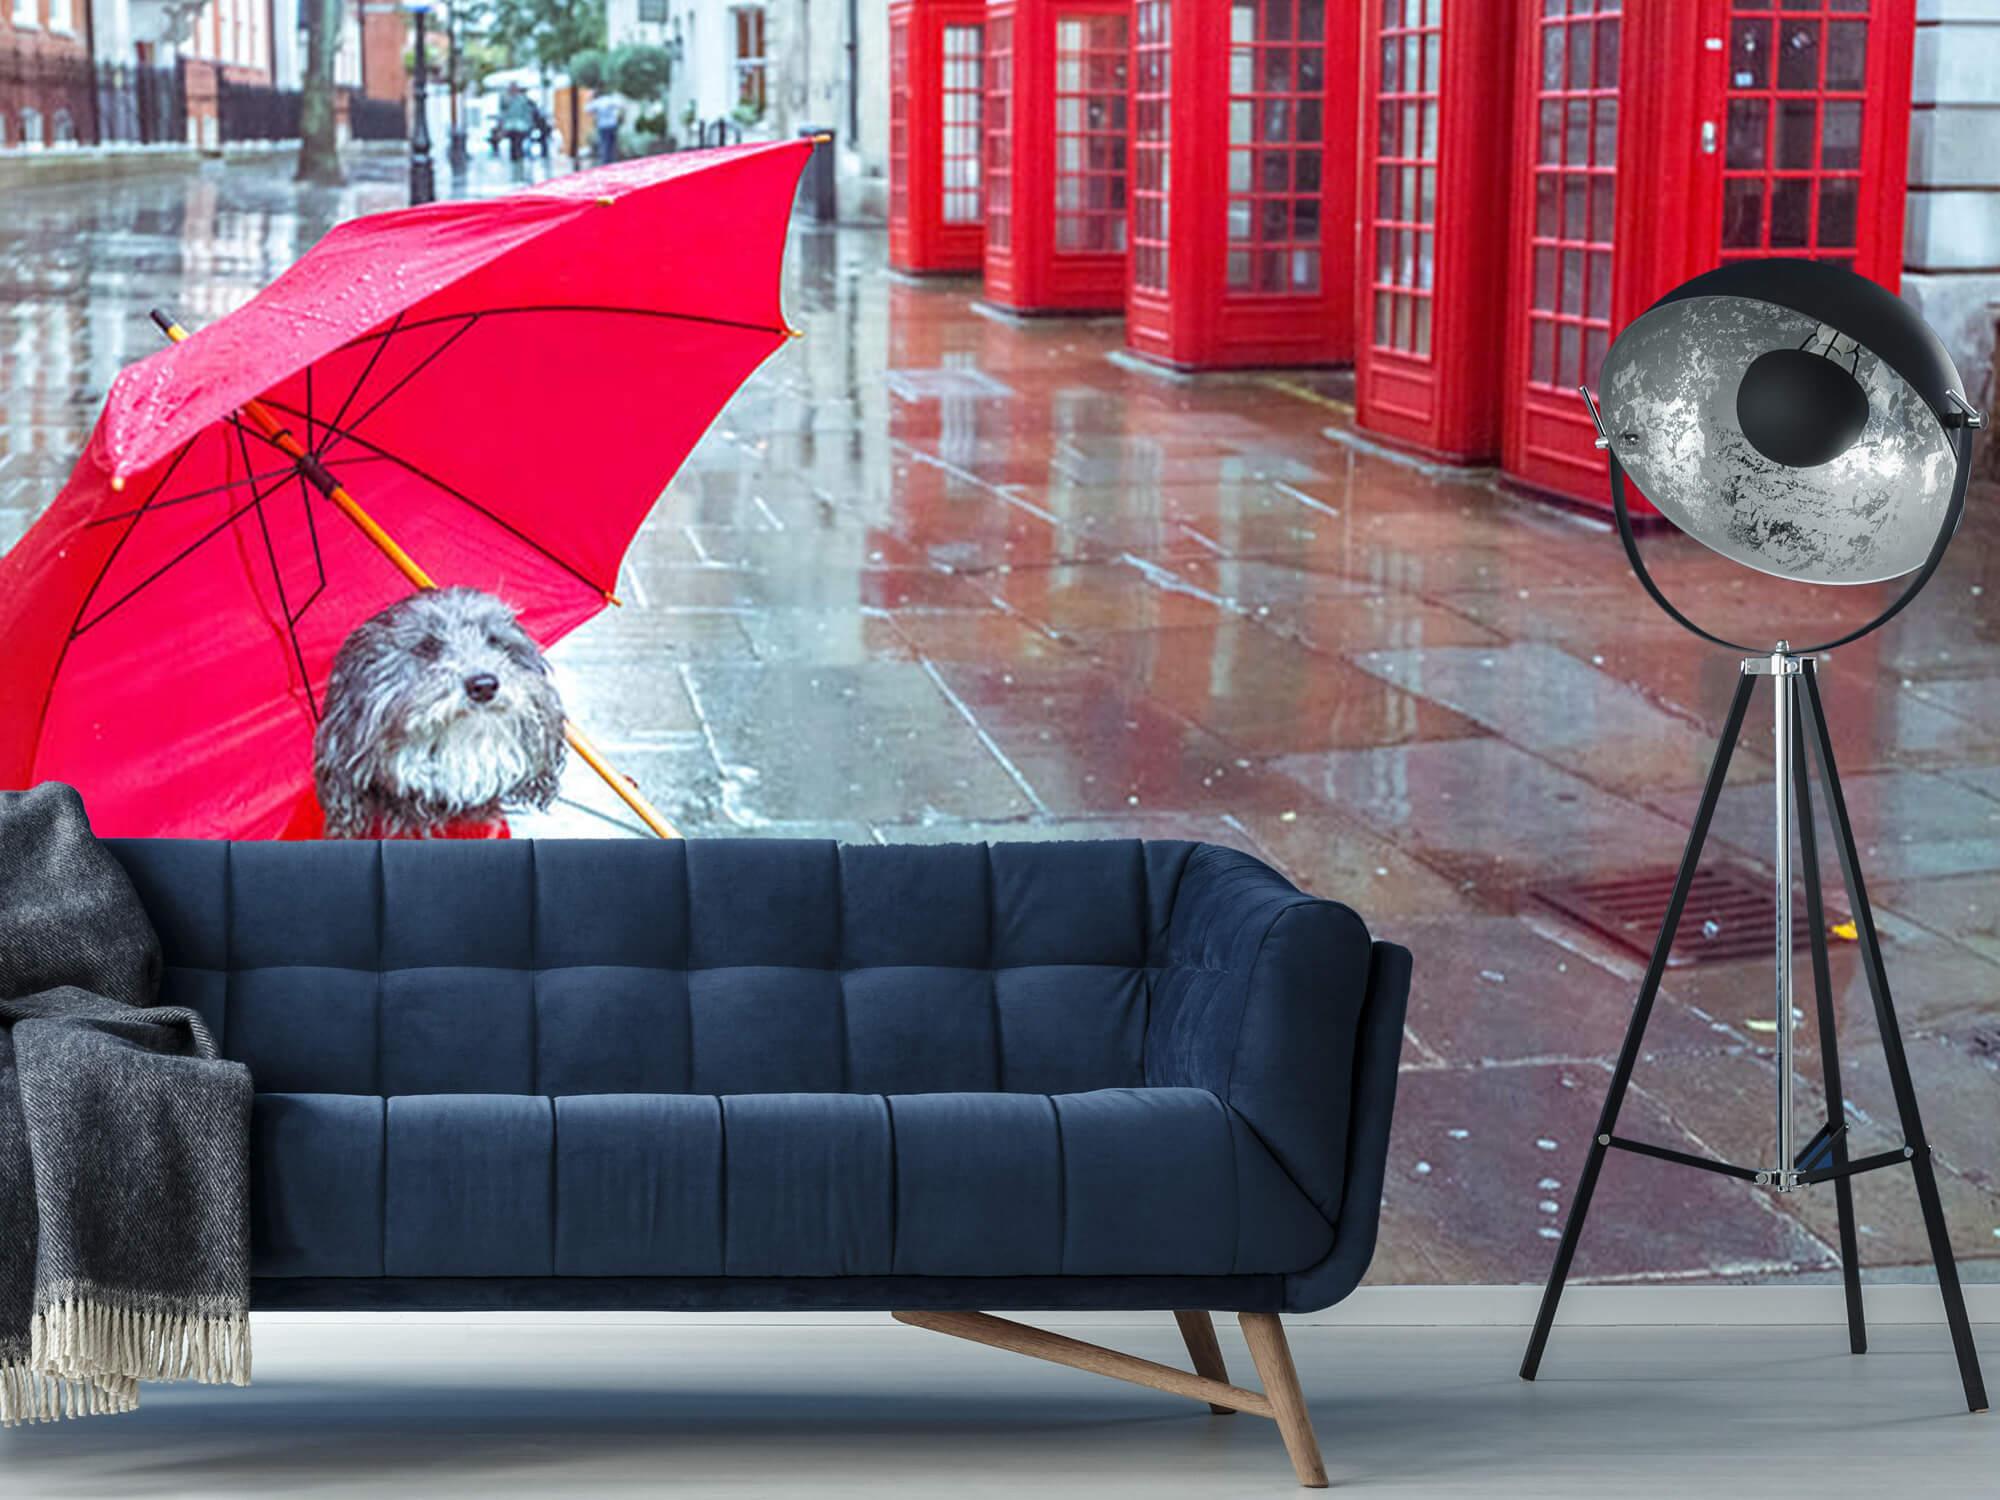 Hond met paraplu 9